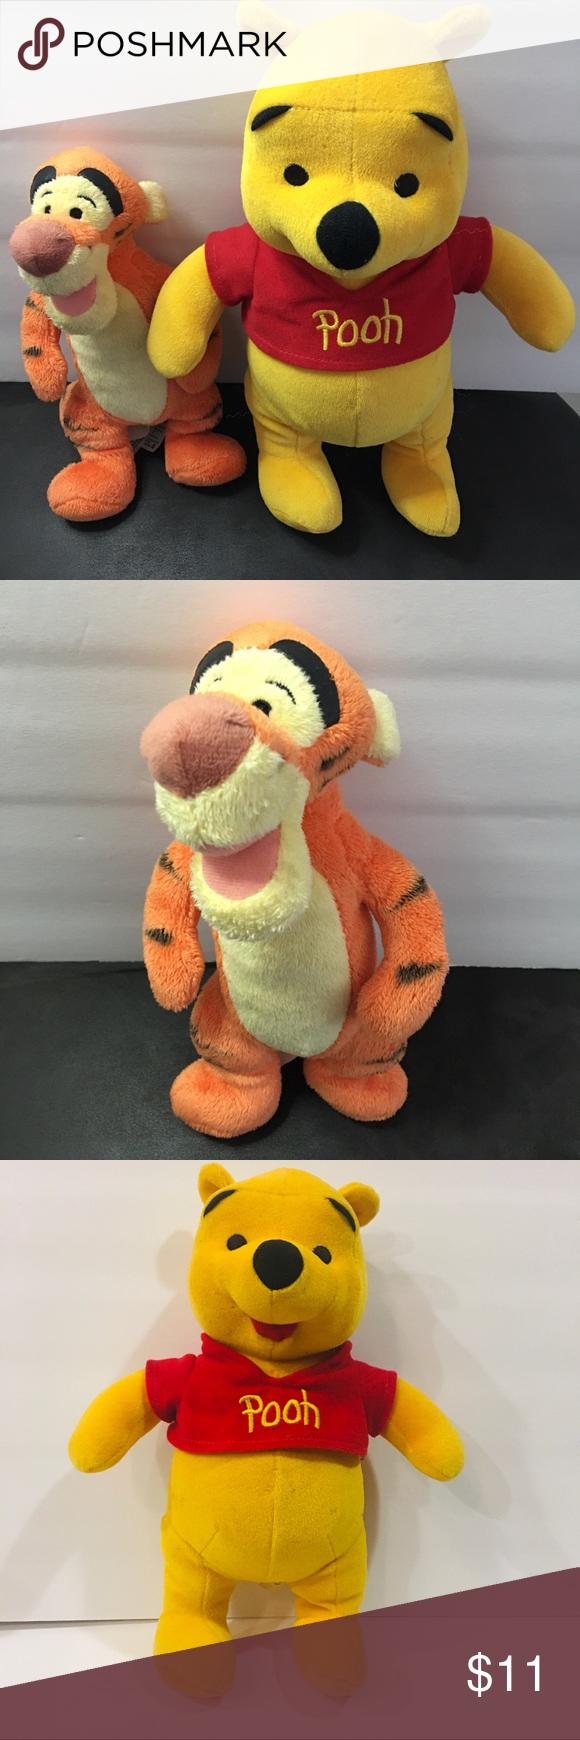 "Mattel Arcotoys Inc Winnie the Pooh Bear Stuffed Doll Animal Toy Plush 11/"""